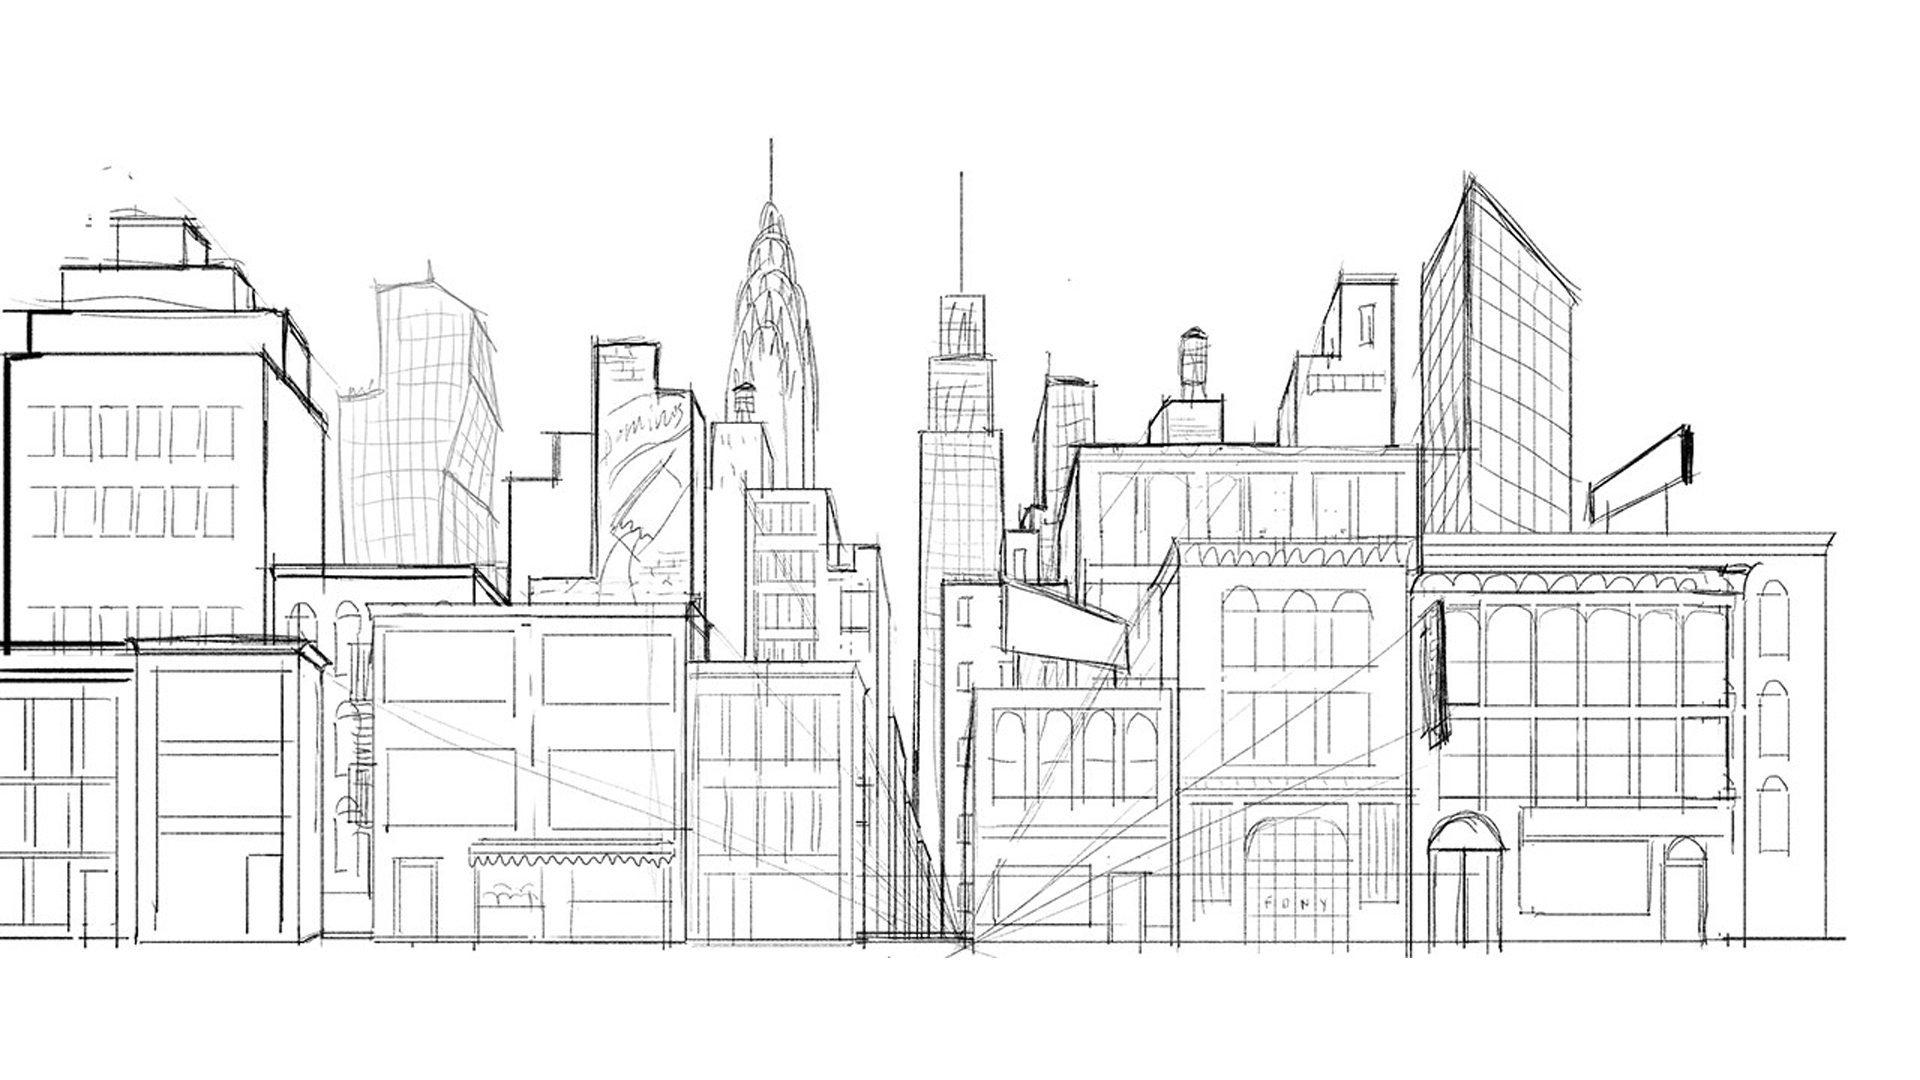 NYC_downtown01_preppedTemp1